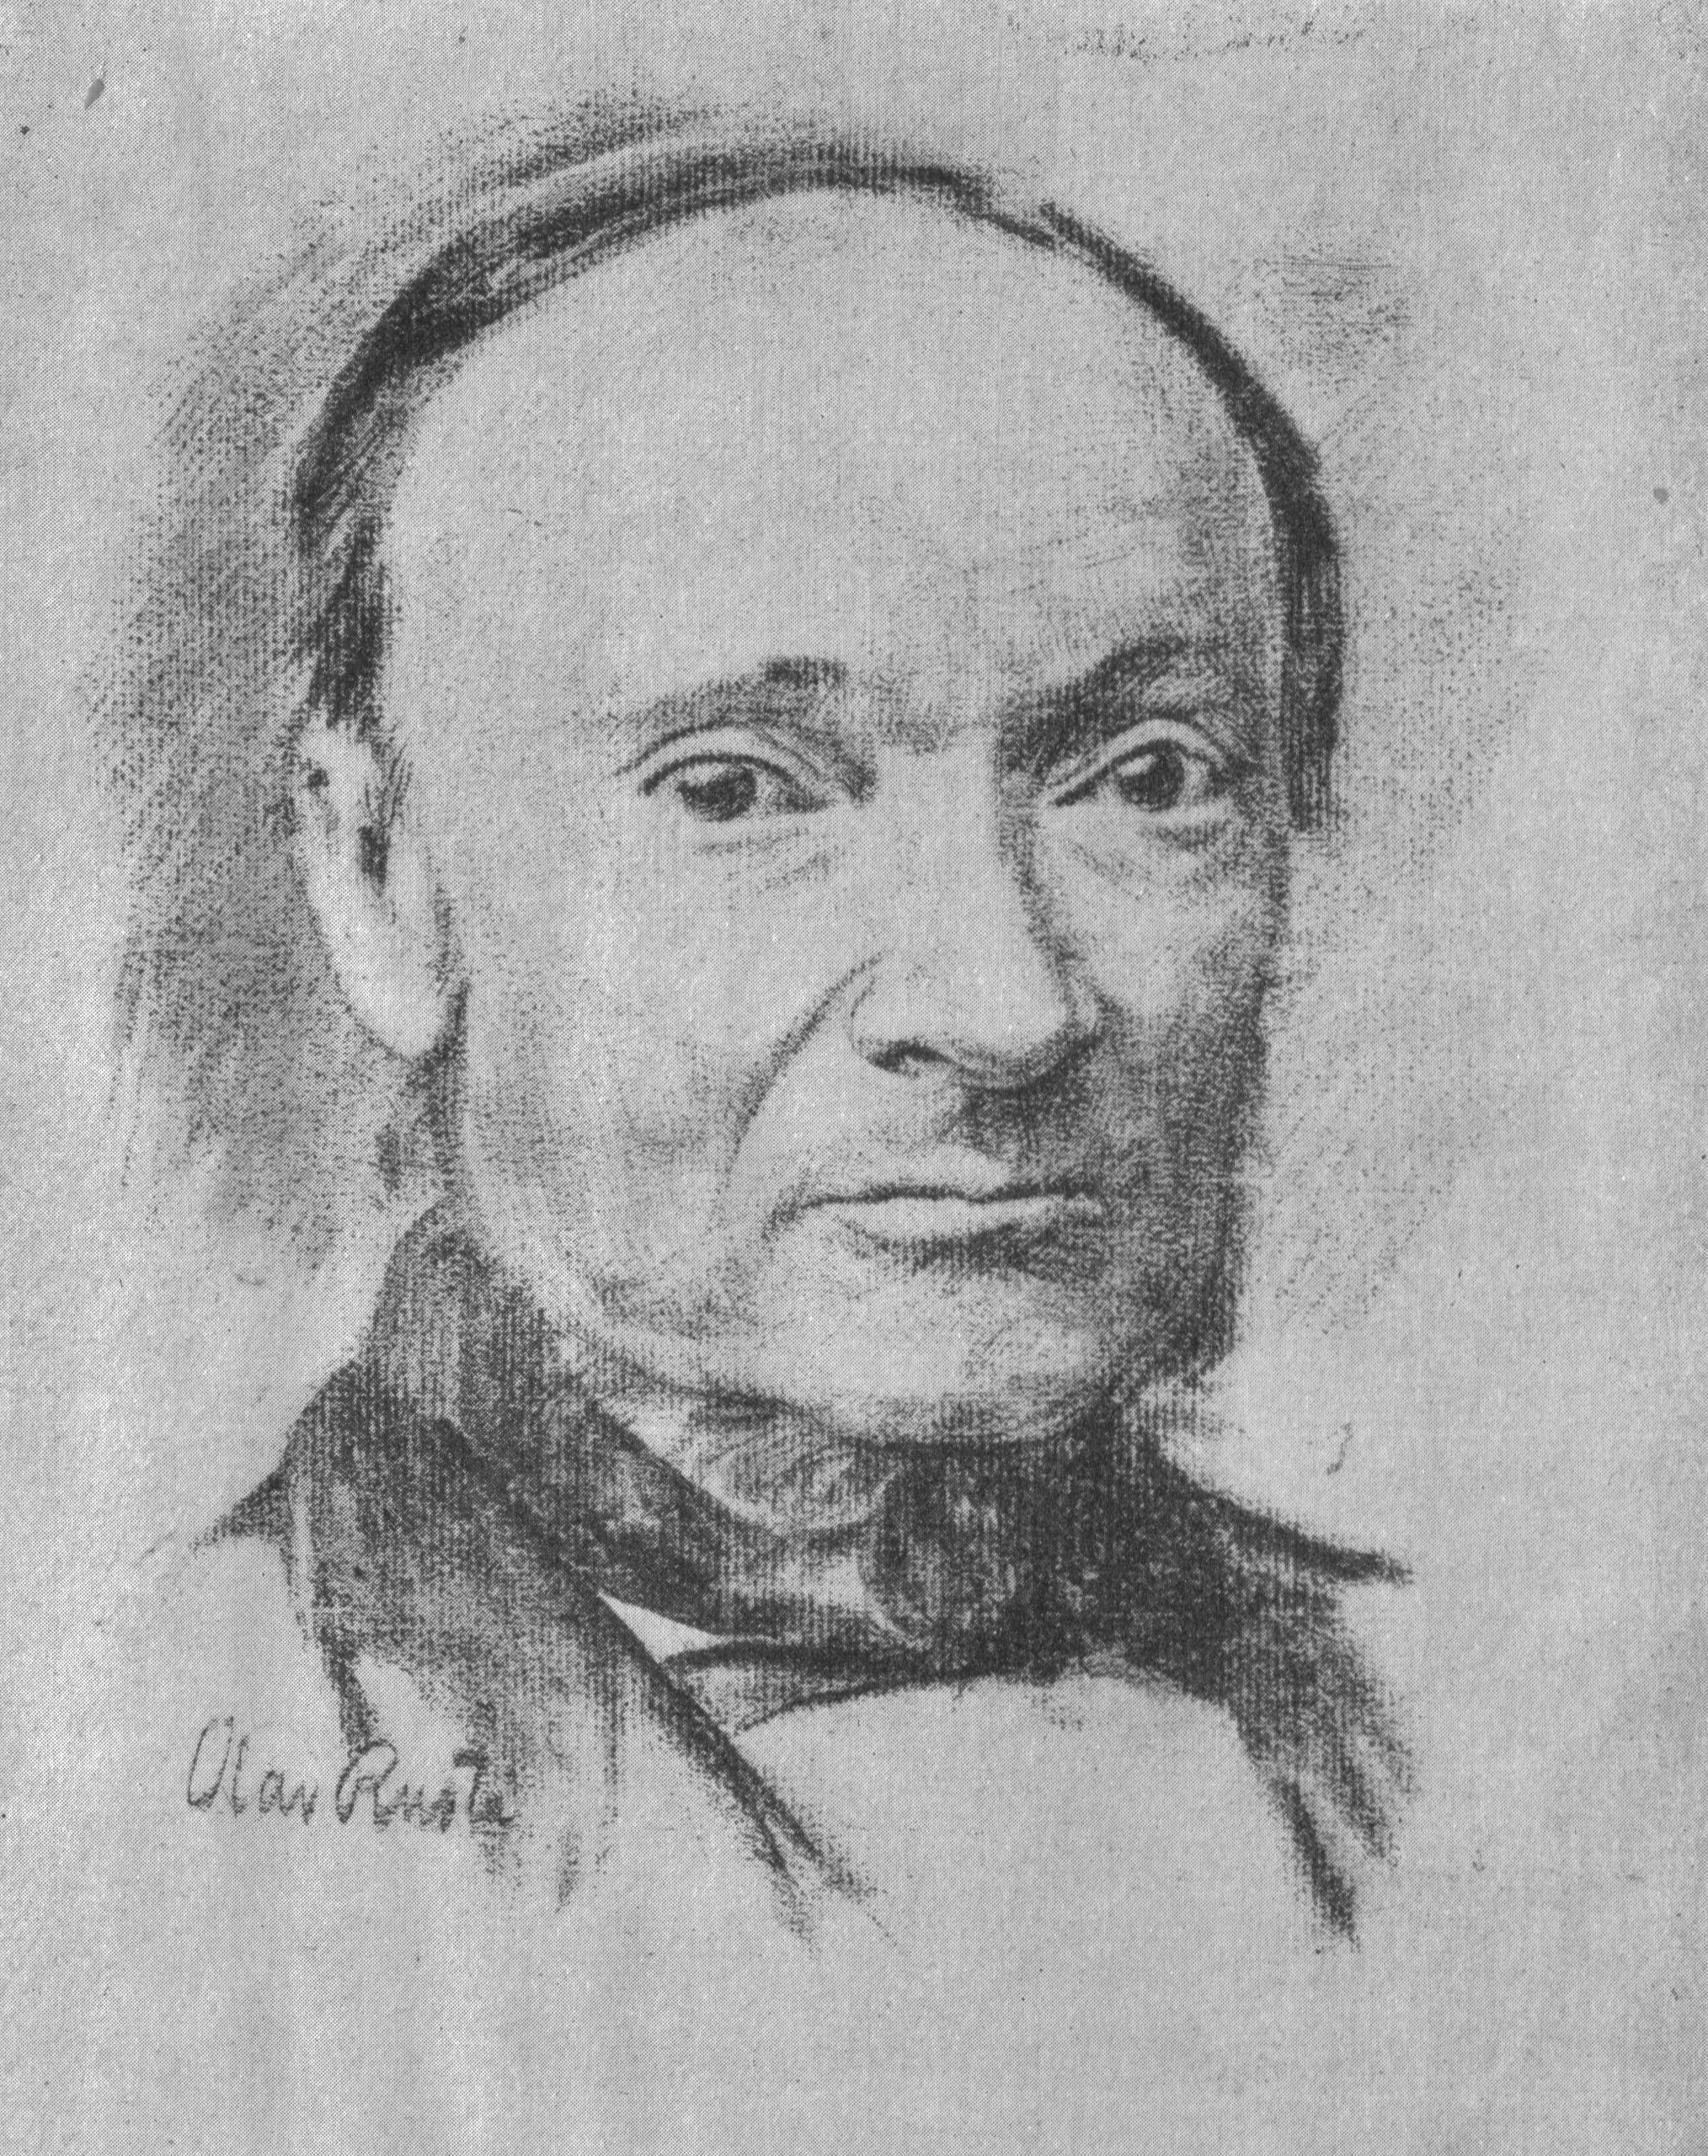 Olav_Rusti-Ivar_Aasen